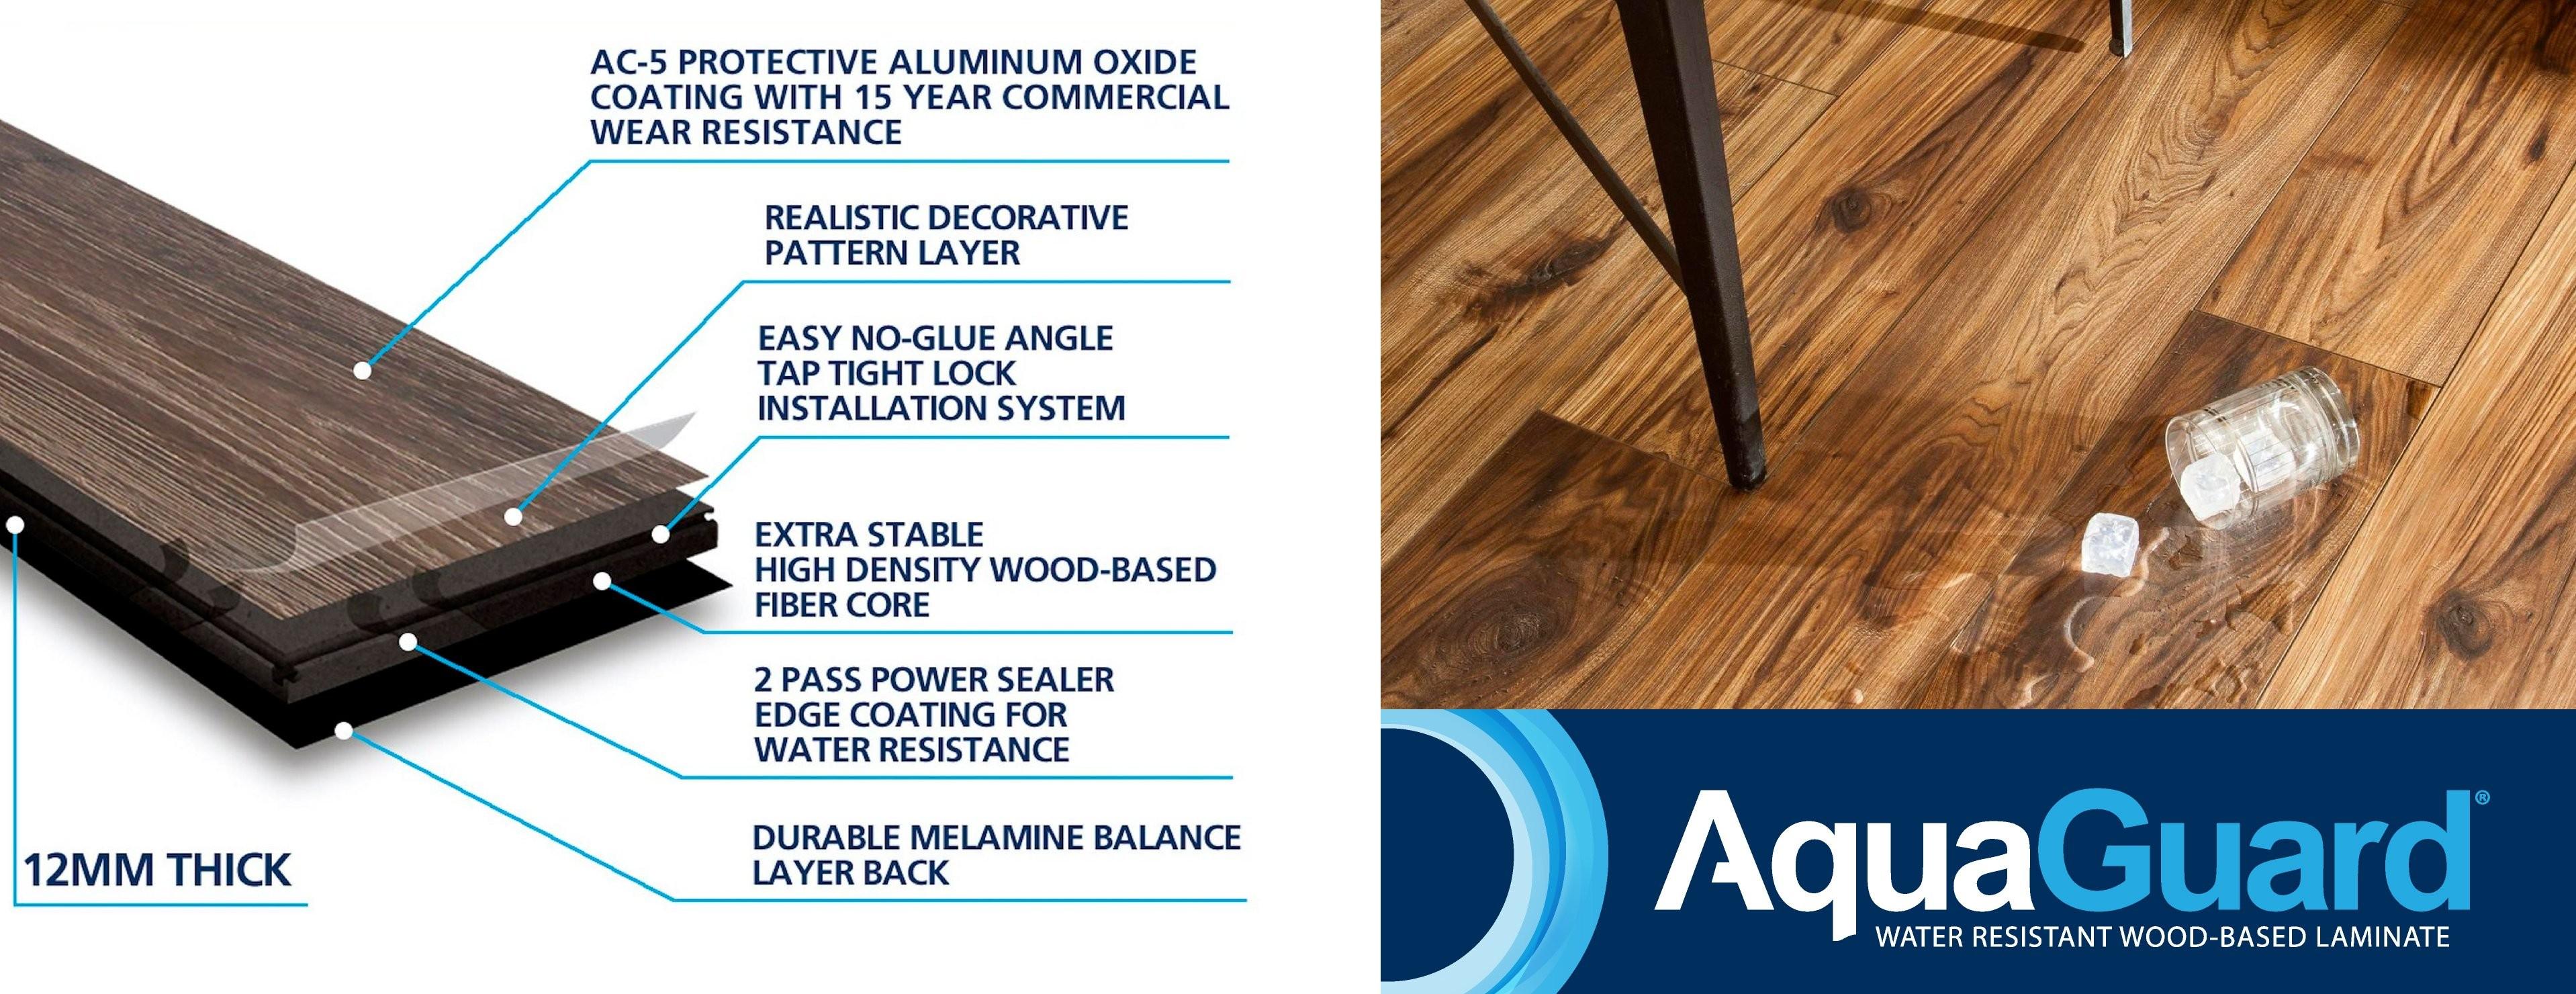 resistant flooring rugs for water interior your bathroom floors design laminate floor you decor do waterproof how